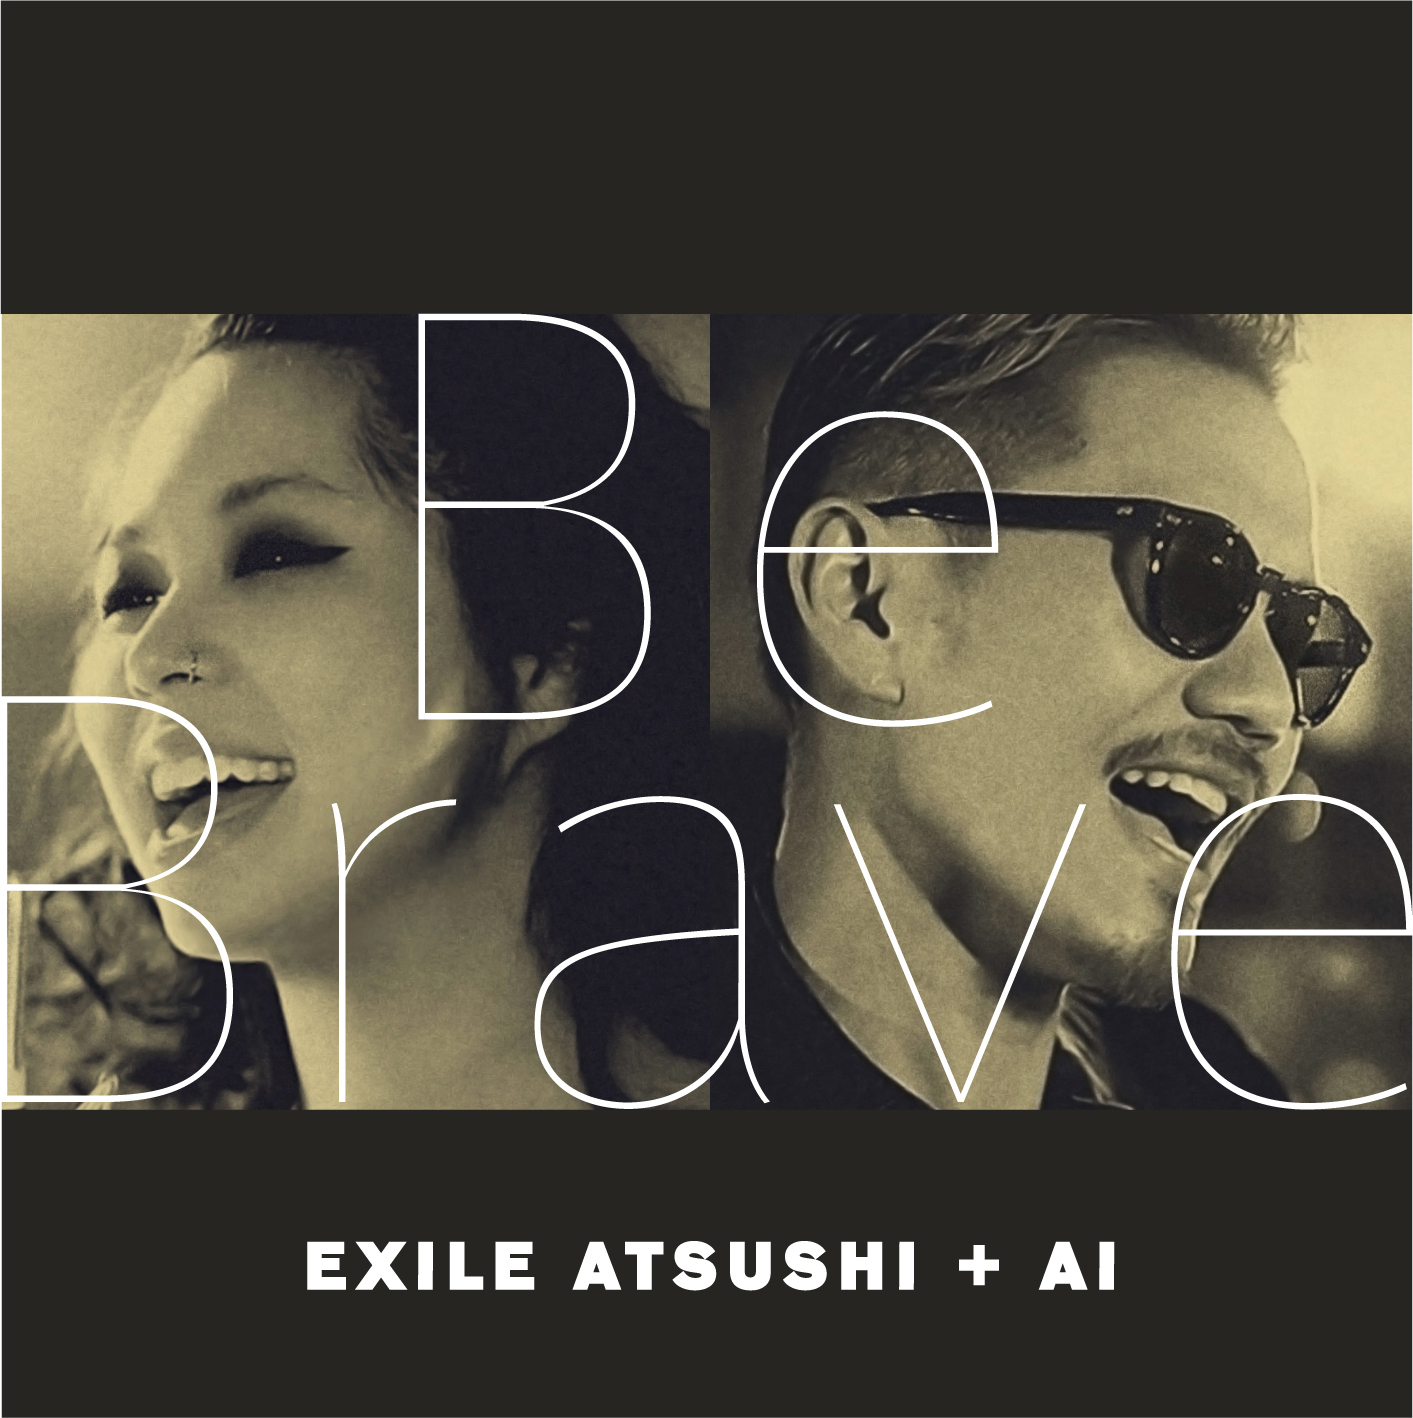 EXILE ATSUSHI + AI  7年ぶりのコラボ実現!『Be Brave』9/9発売!